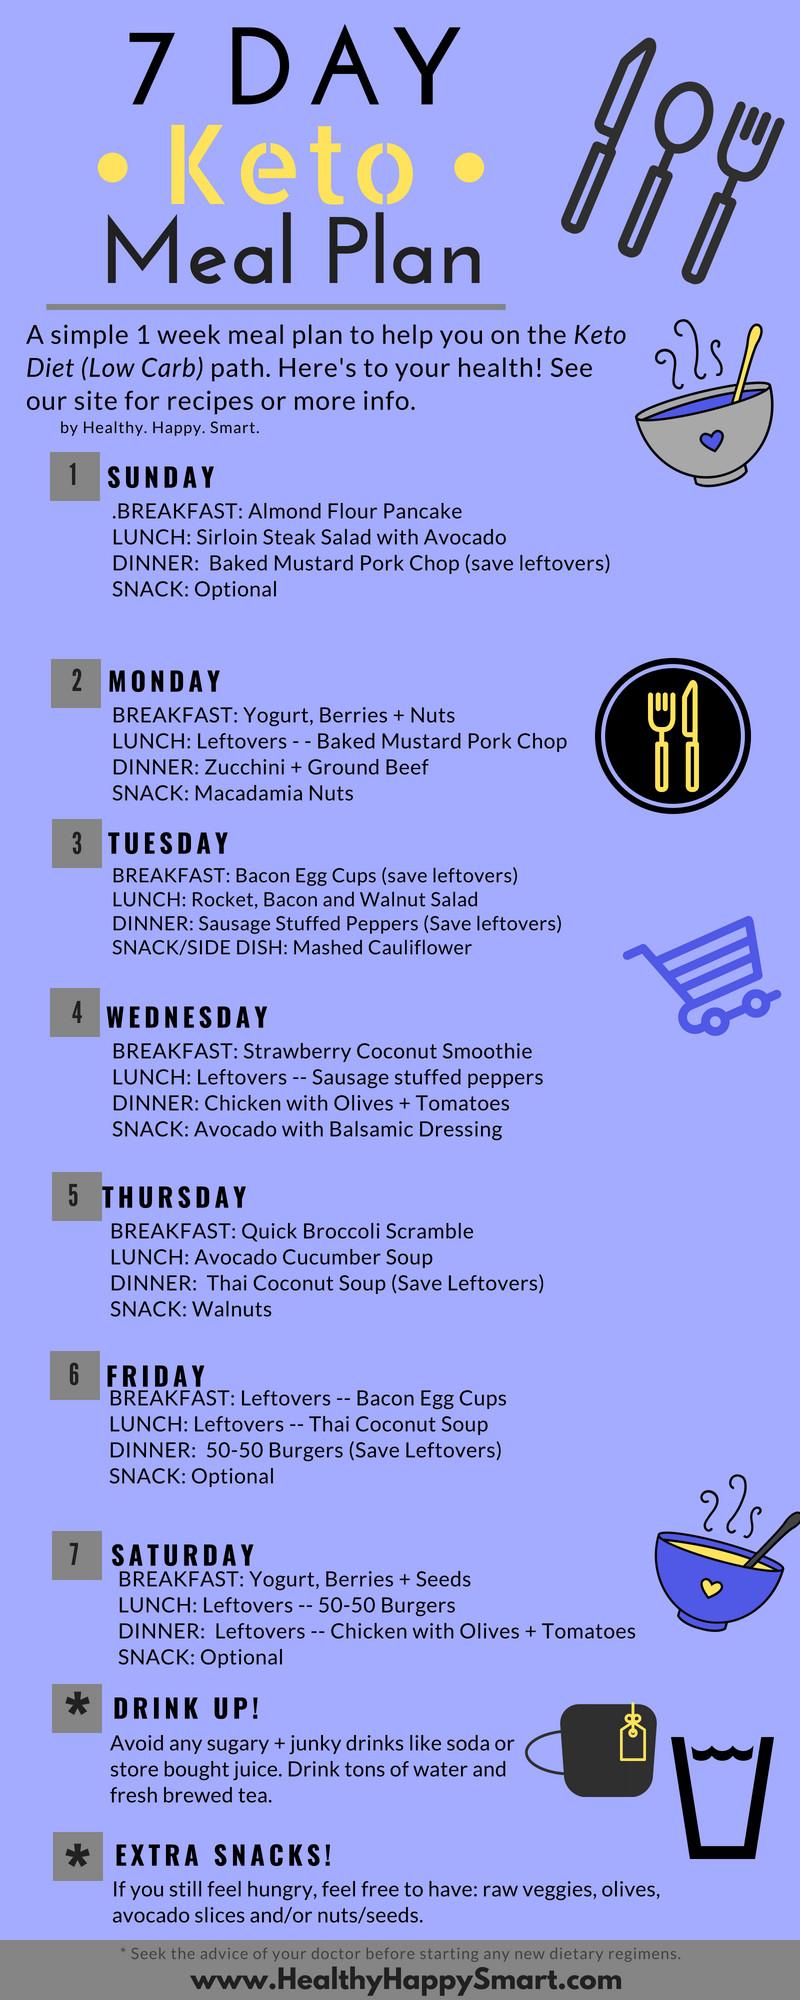 Free Keto Diet Plan  7 Day Keto Meal Plan Sample Keto Weekly Meal Plans